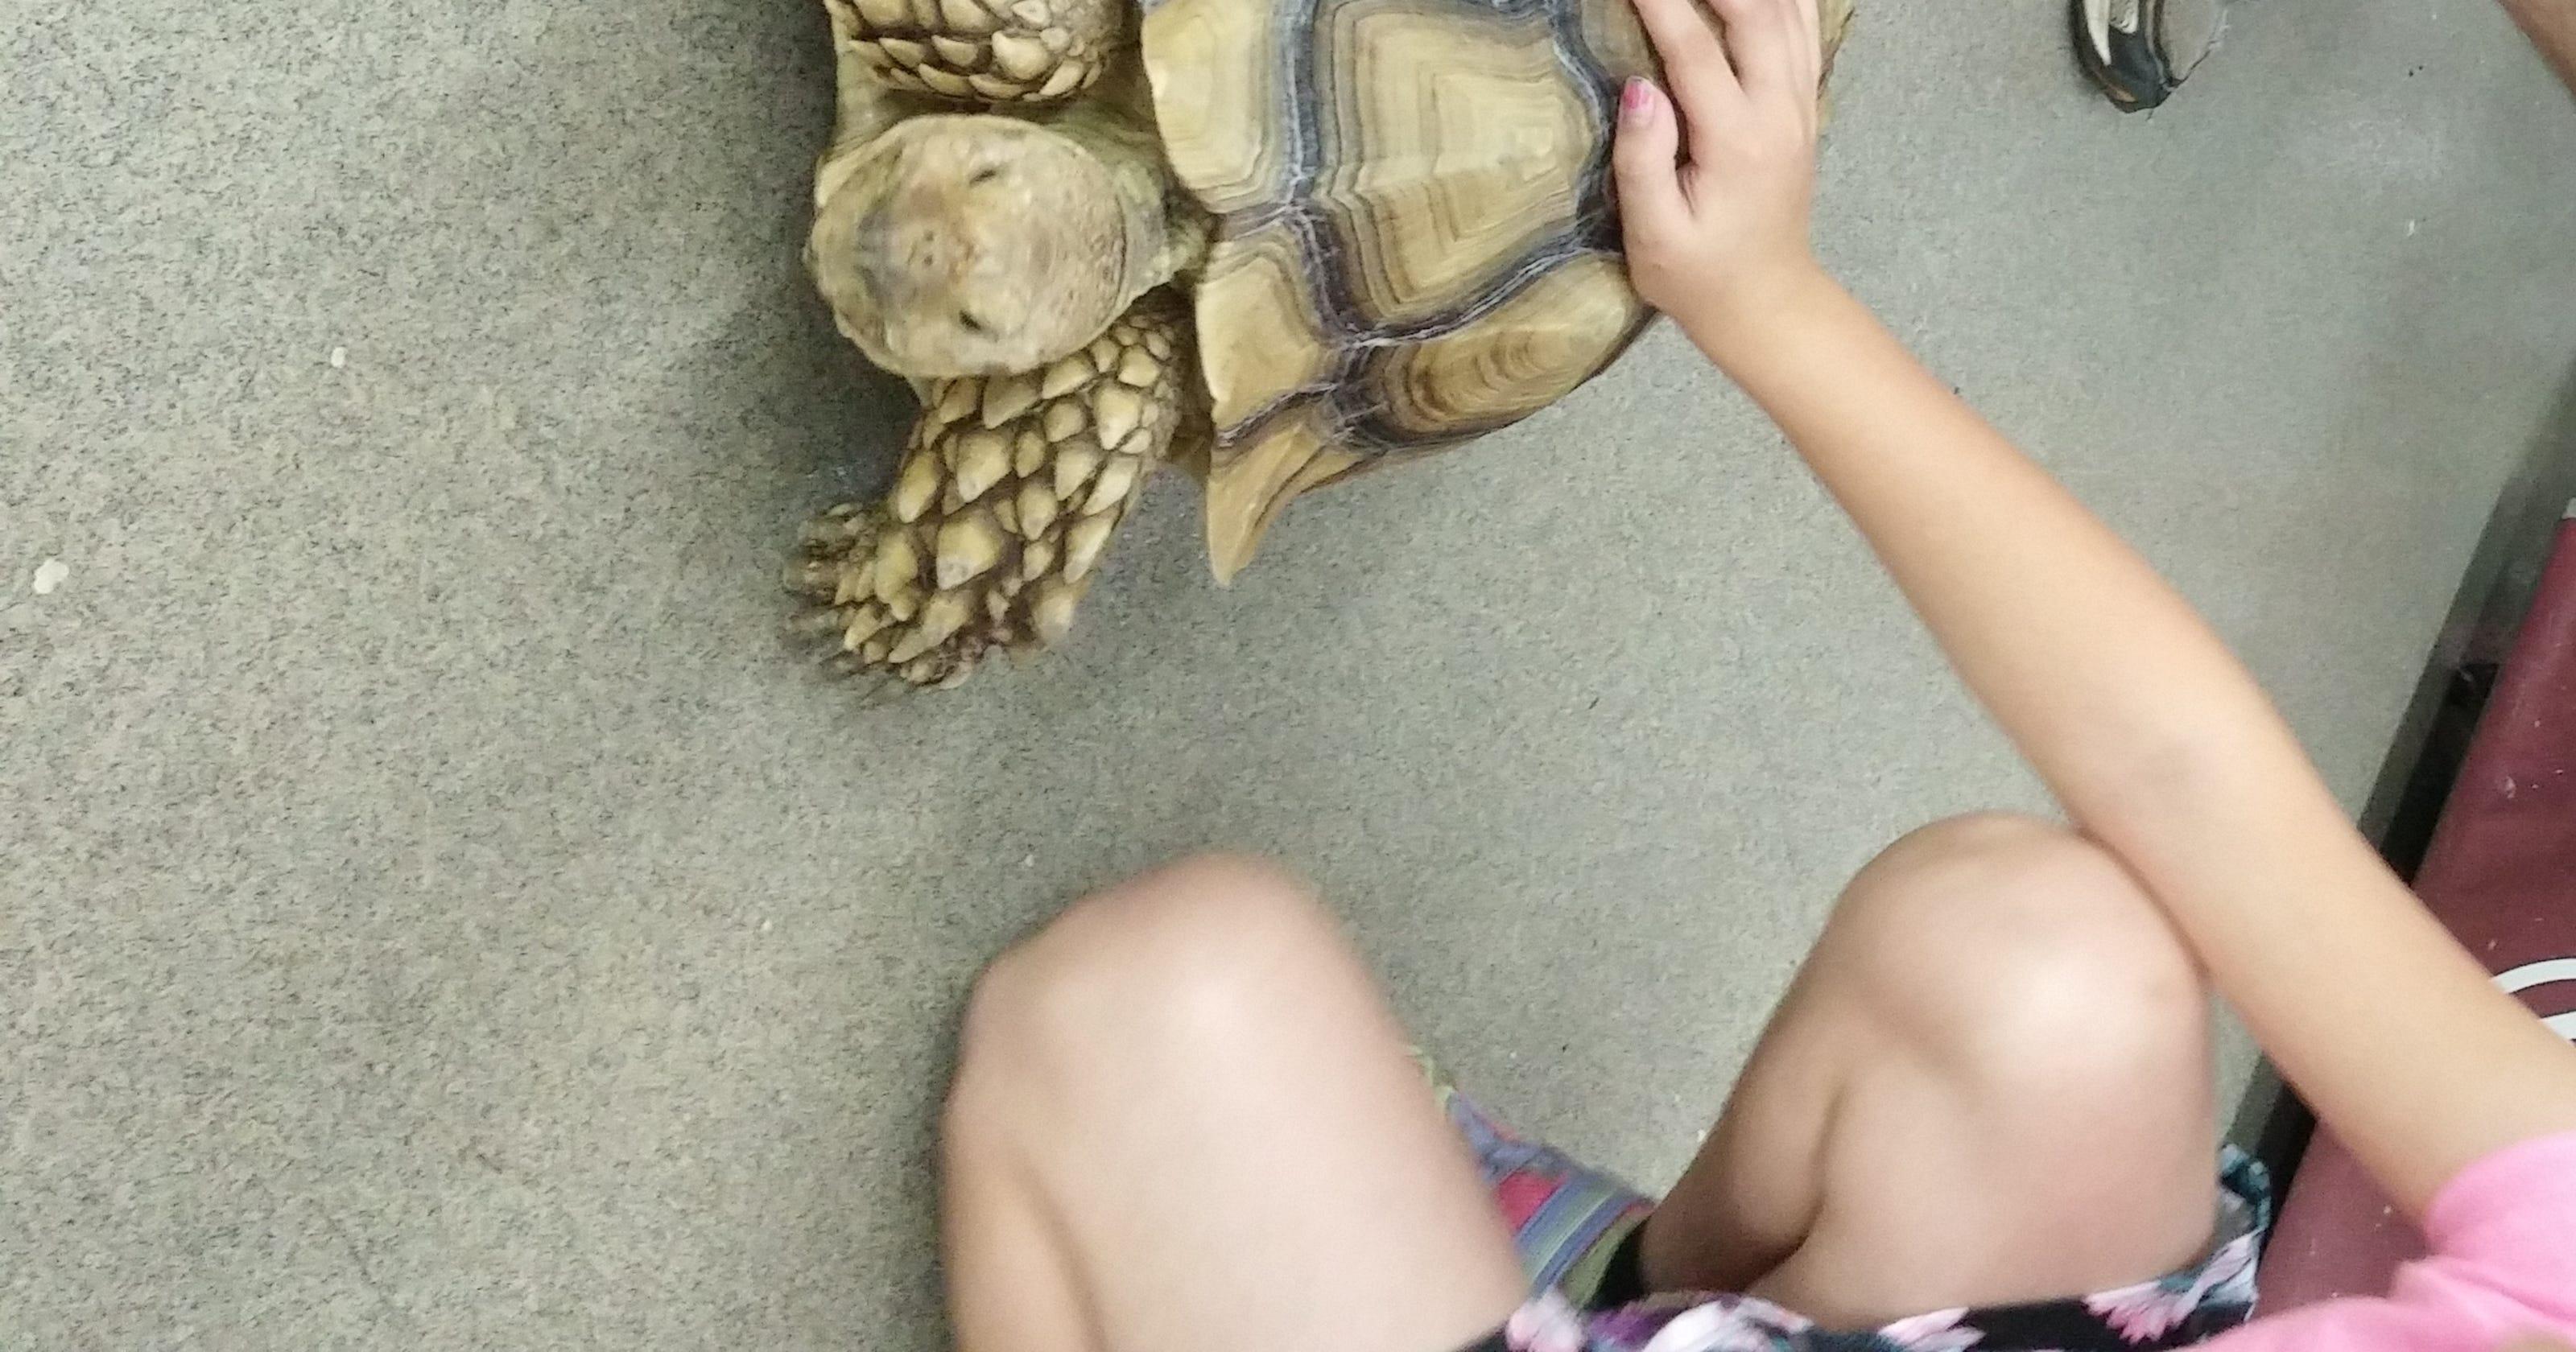 Petland Pensacola advocates responsible pet ownership